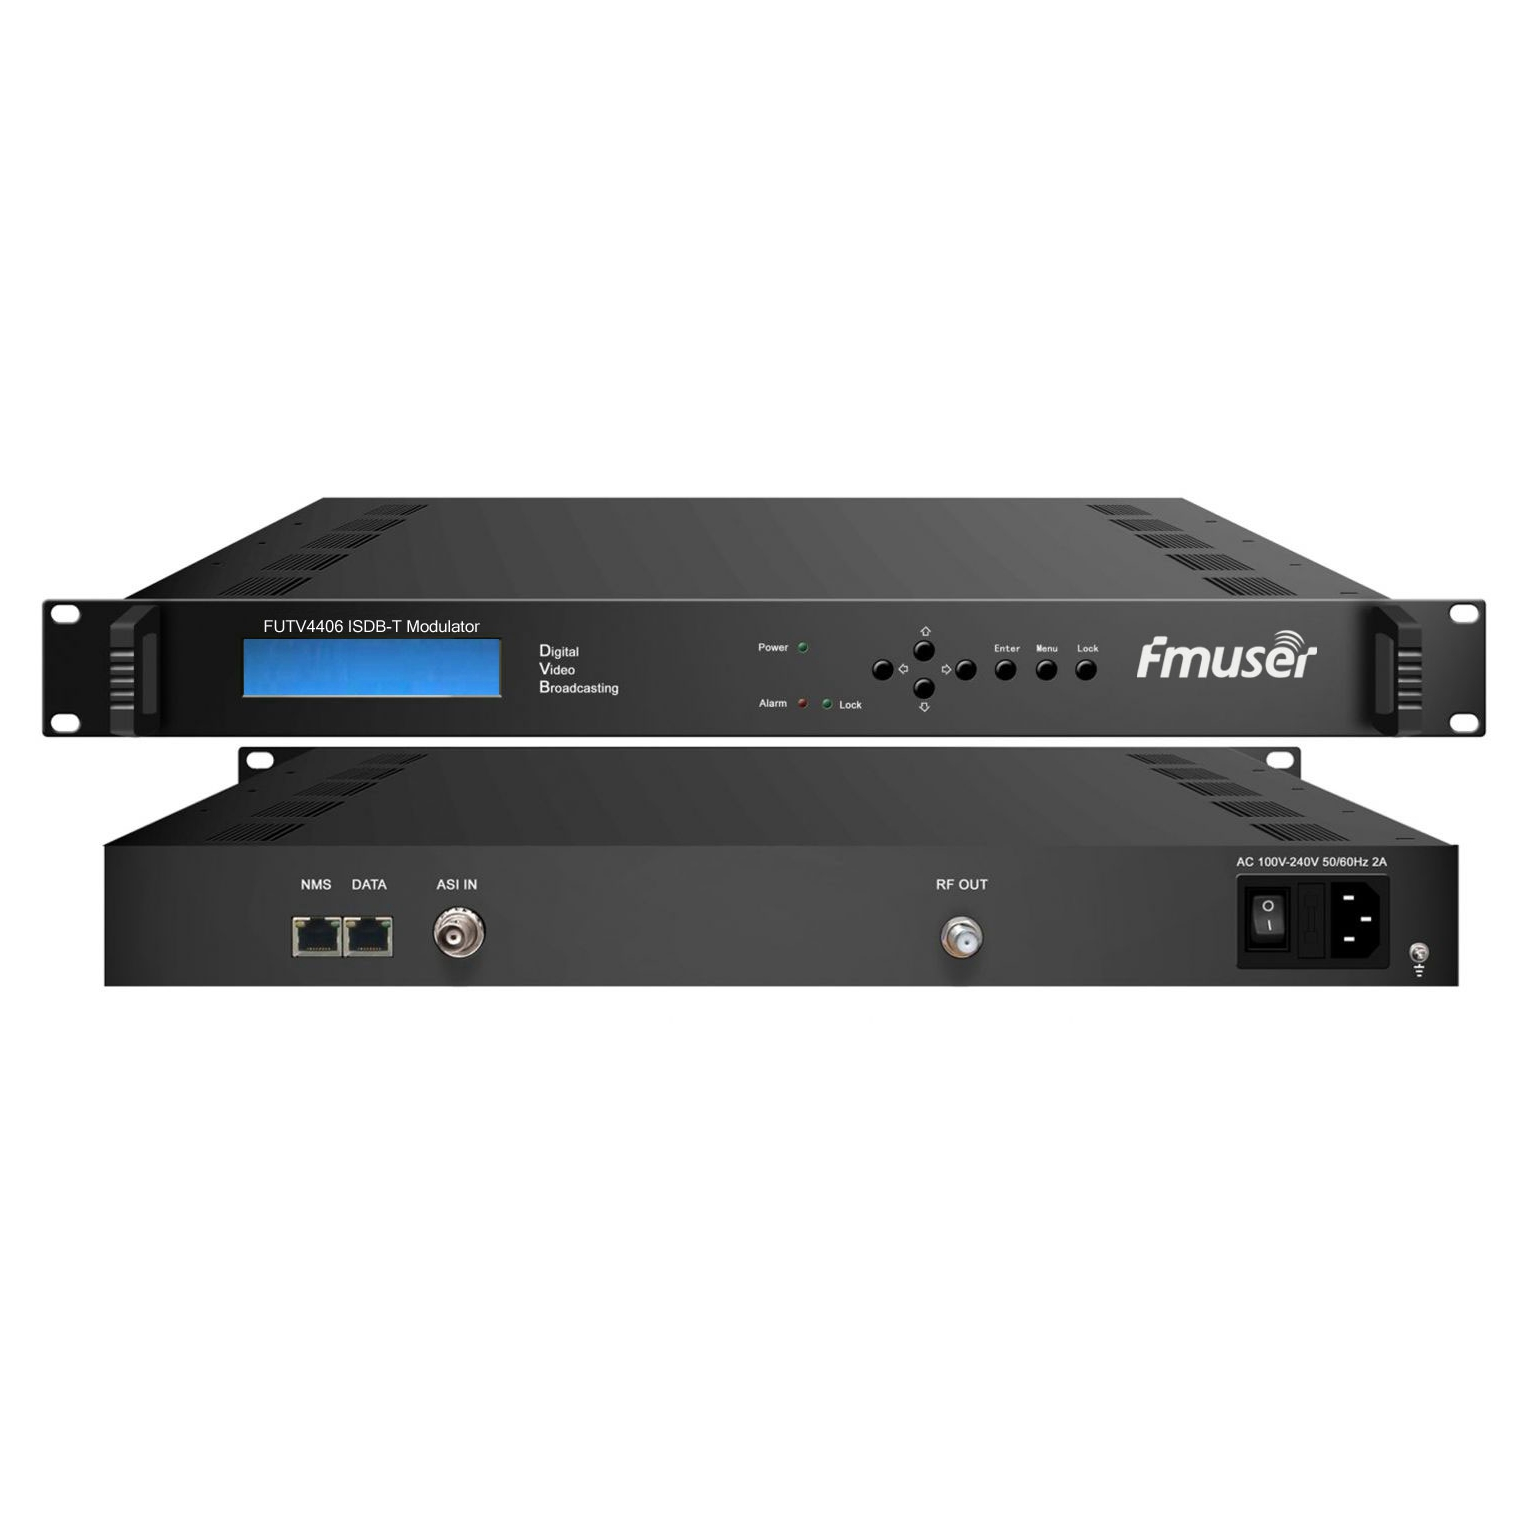 FMUSER FUTV4406 IP ISDB-T Moduliatorius (1000M TL 4 * TL, 4 * TL iš) su tinklo valdymo